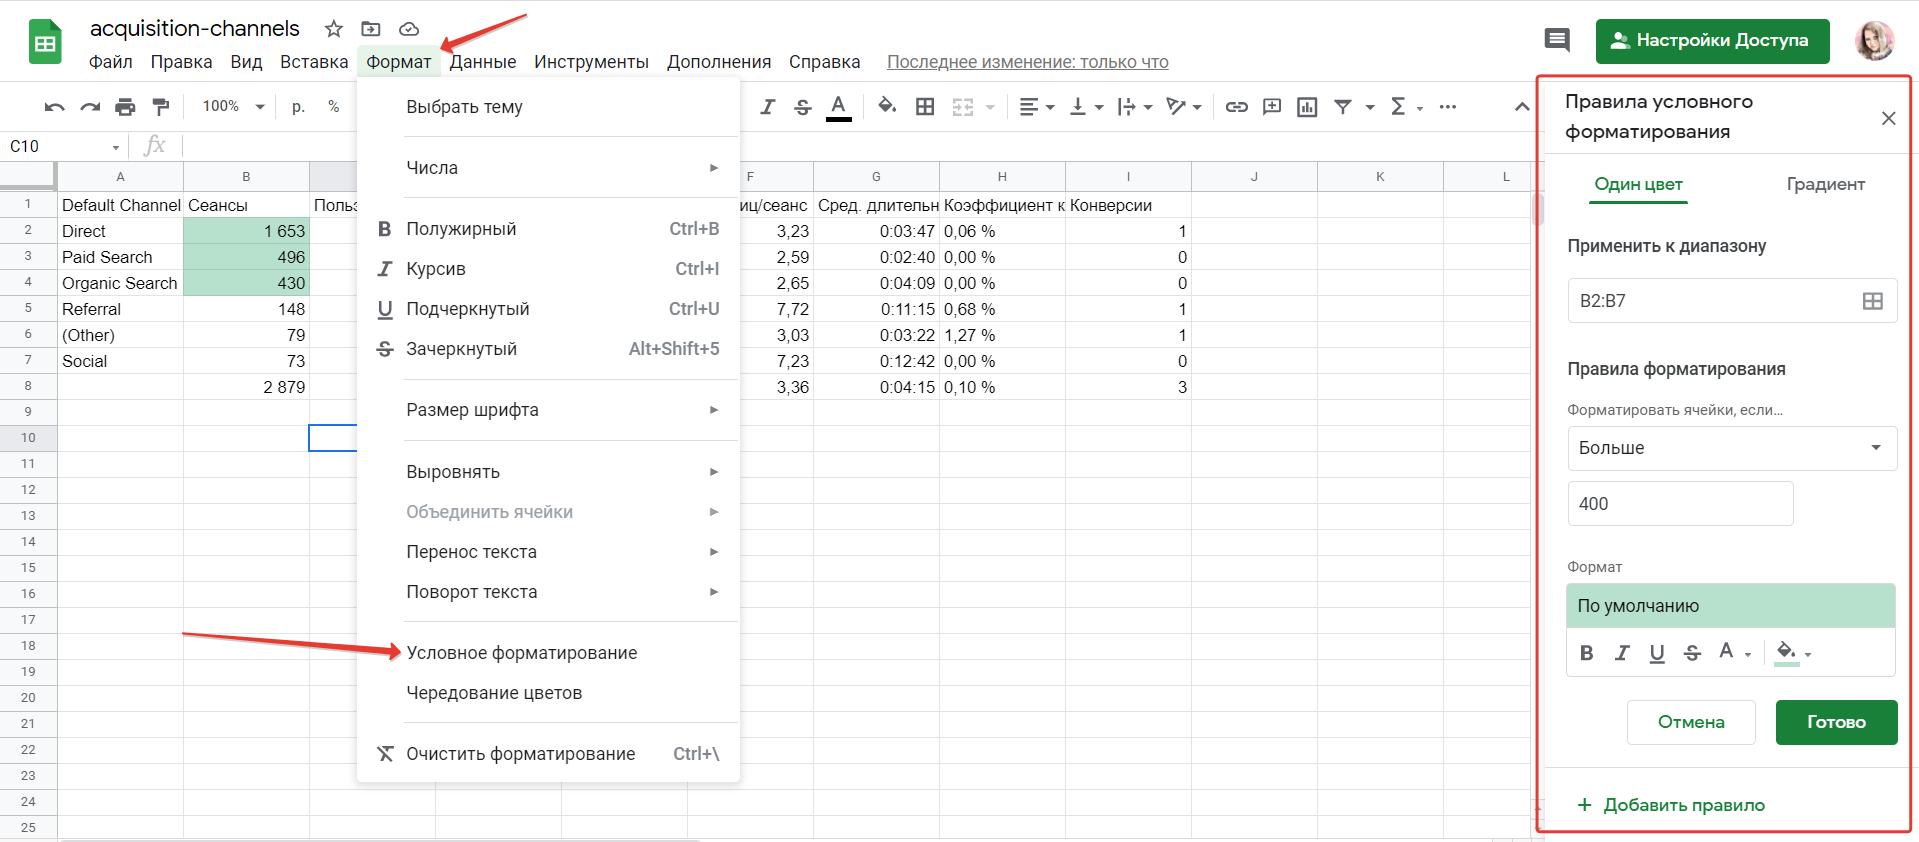 Настройки условного форматирования в «Google Таблицах»